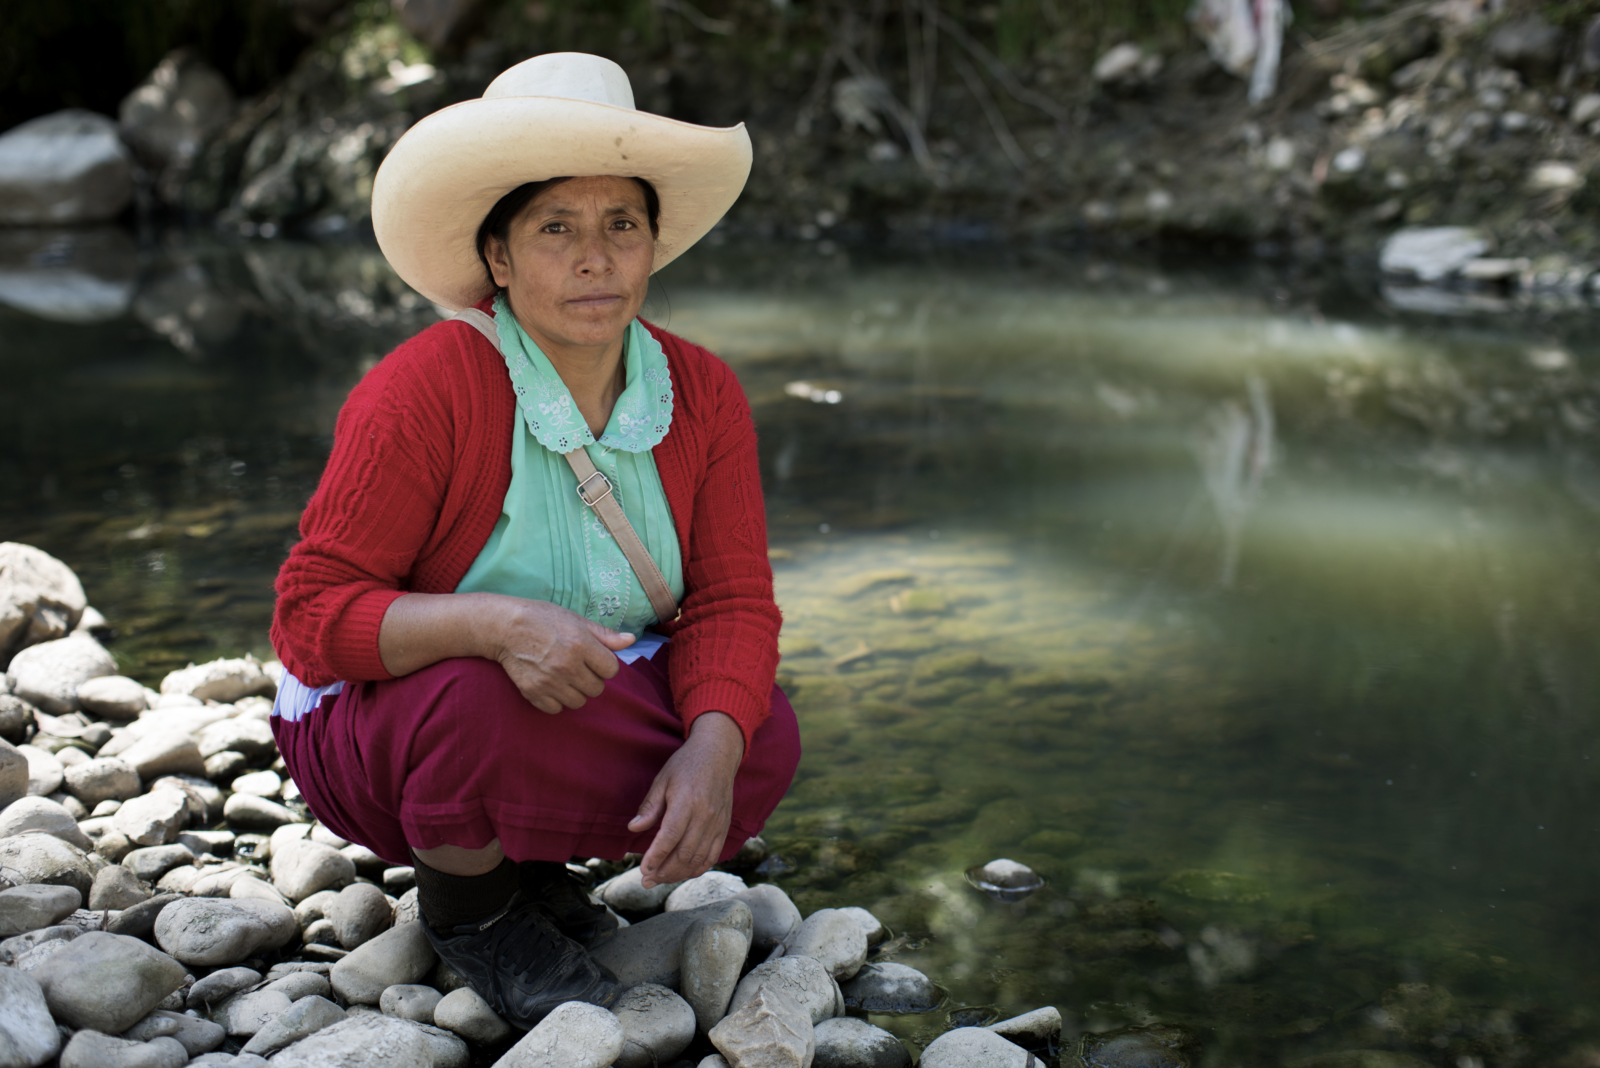 Peru: Peruvian authorities put an end to the criminalisation of defender Máxima Acuña